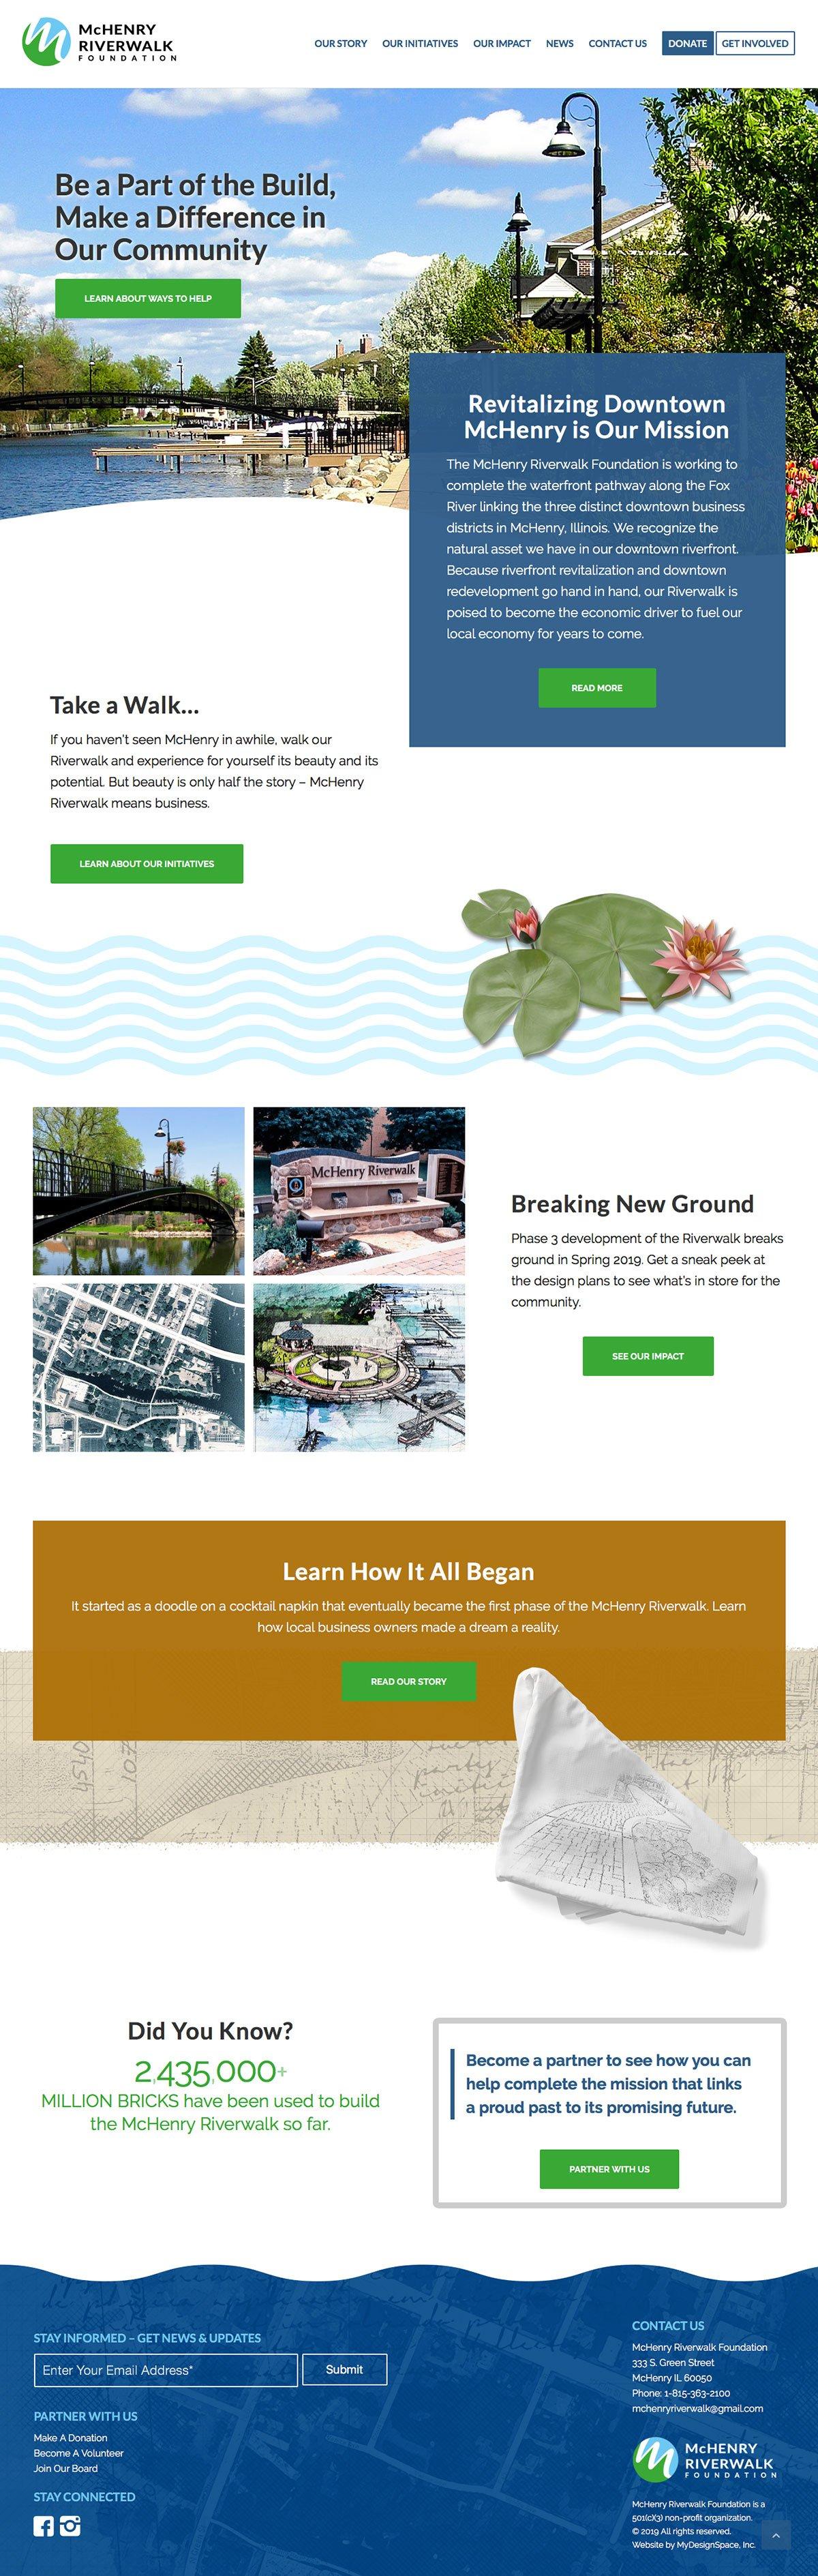 McHenry Riverwalk Foundation Home Page